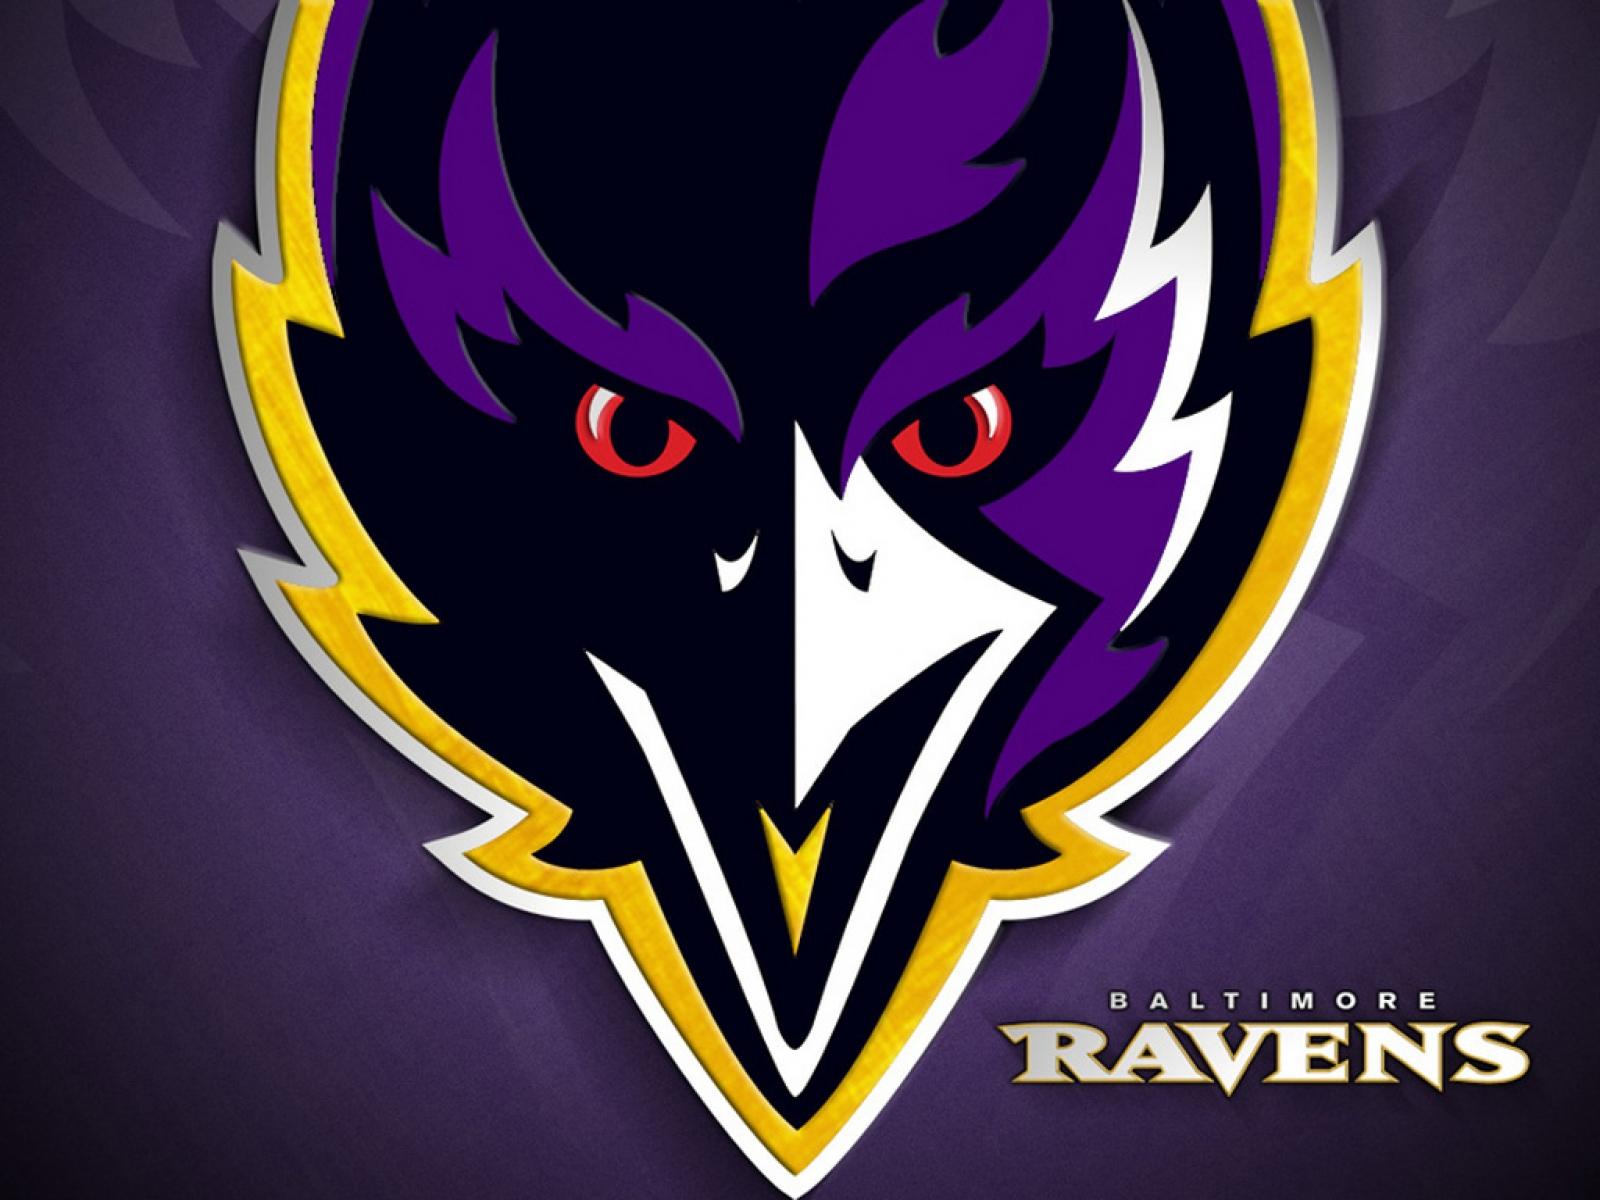 best Baltimore Ravens wallpaper ever Baltimore Ravens wallpapers 1600x1200